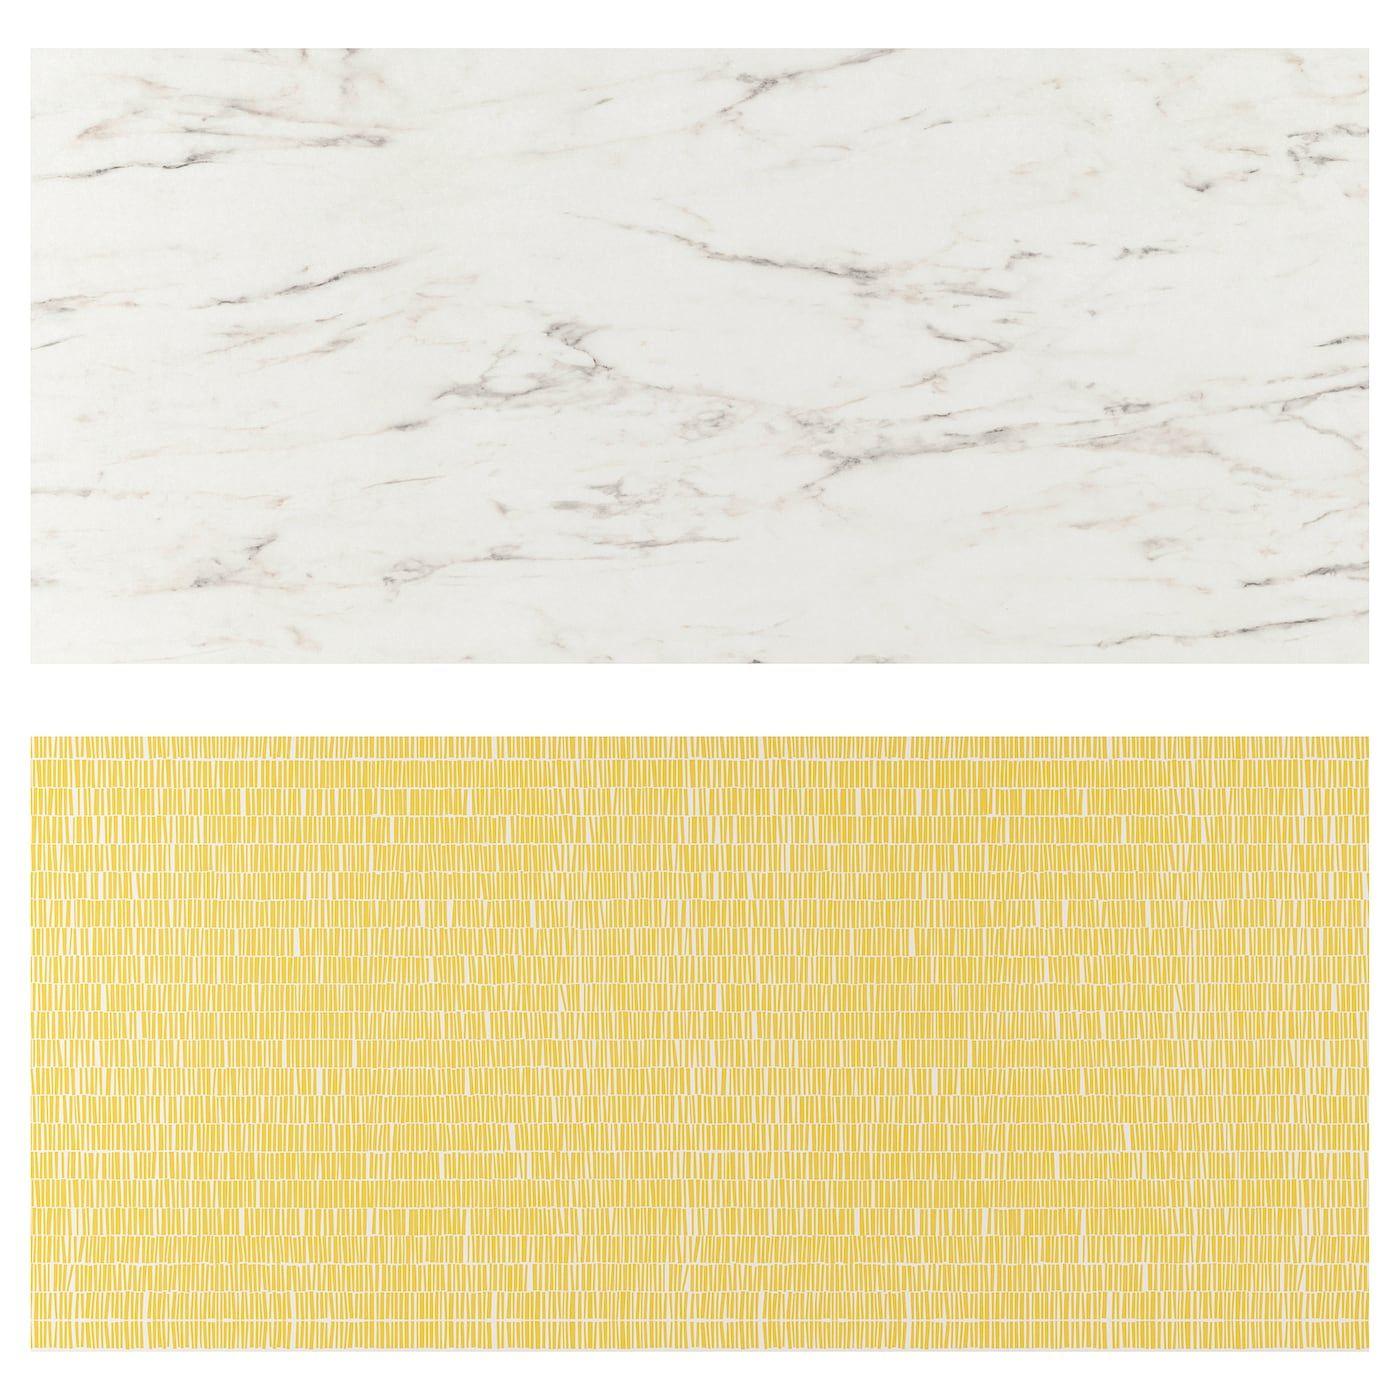 Lysekil Wall Panel Double Sided White Marble Effect Patterned Ikea In 2020 Wandverkleidung Wandpaneele Kuchenwandpaneele